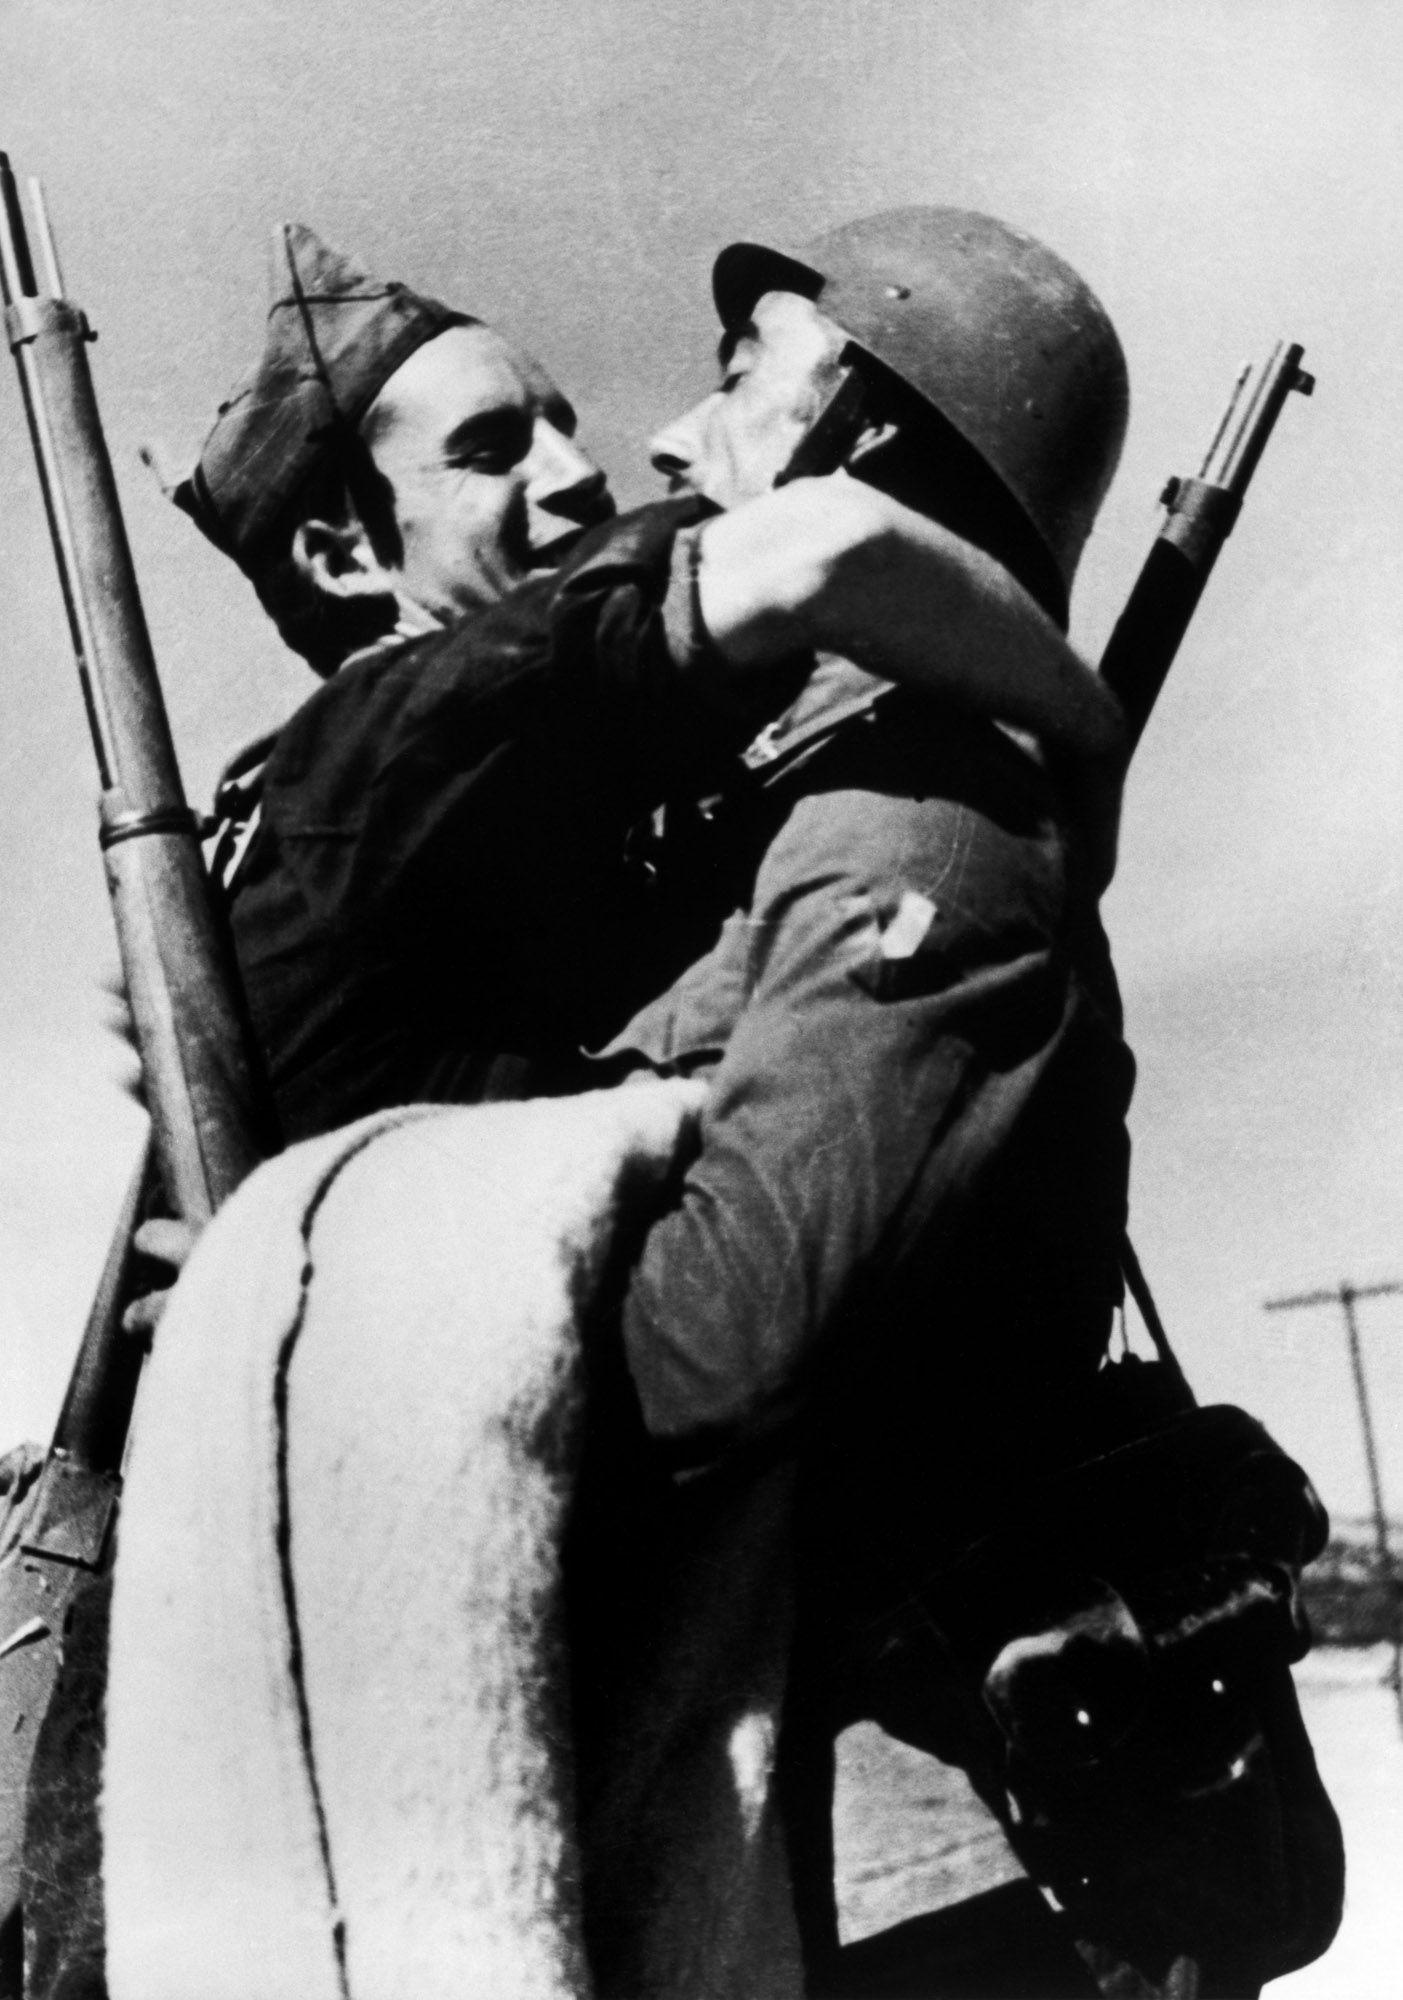 #RobertCapa99 - guerra civile in Spagna